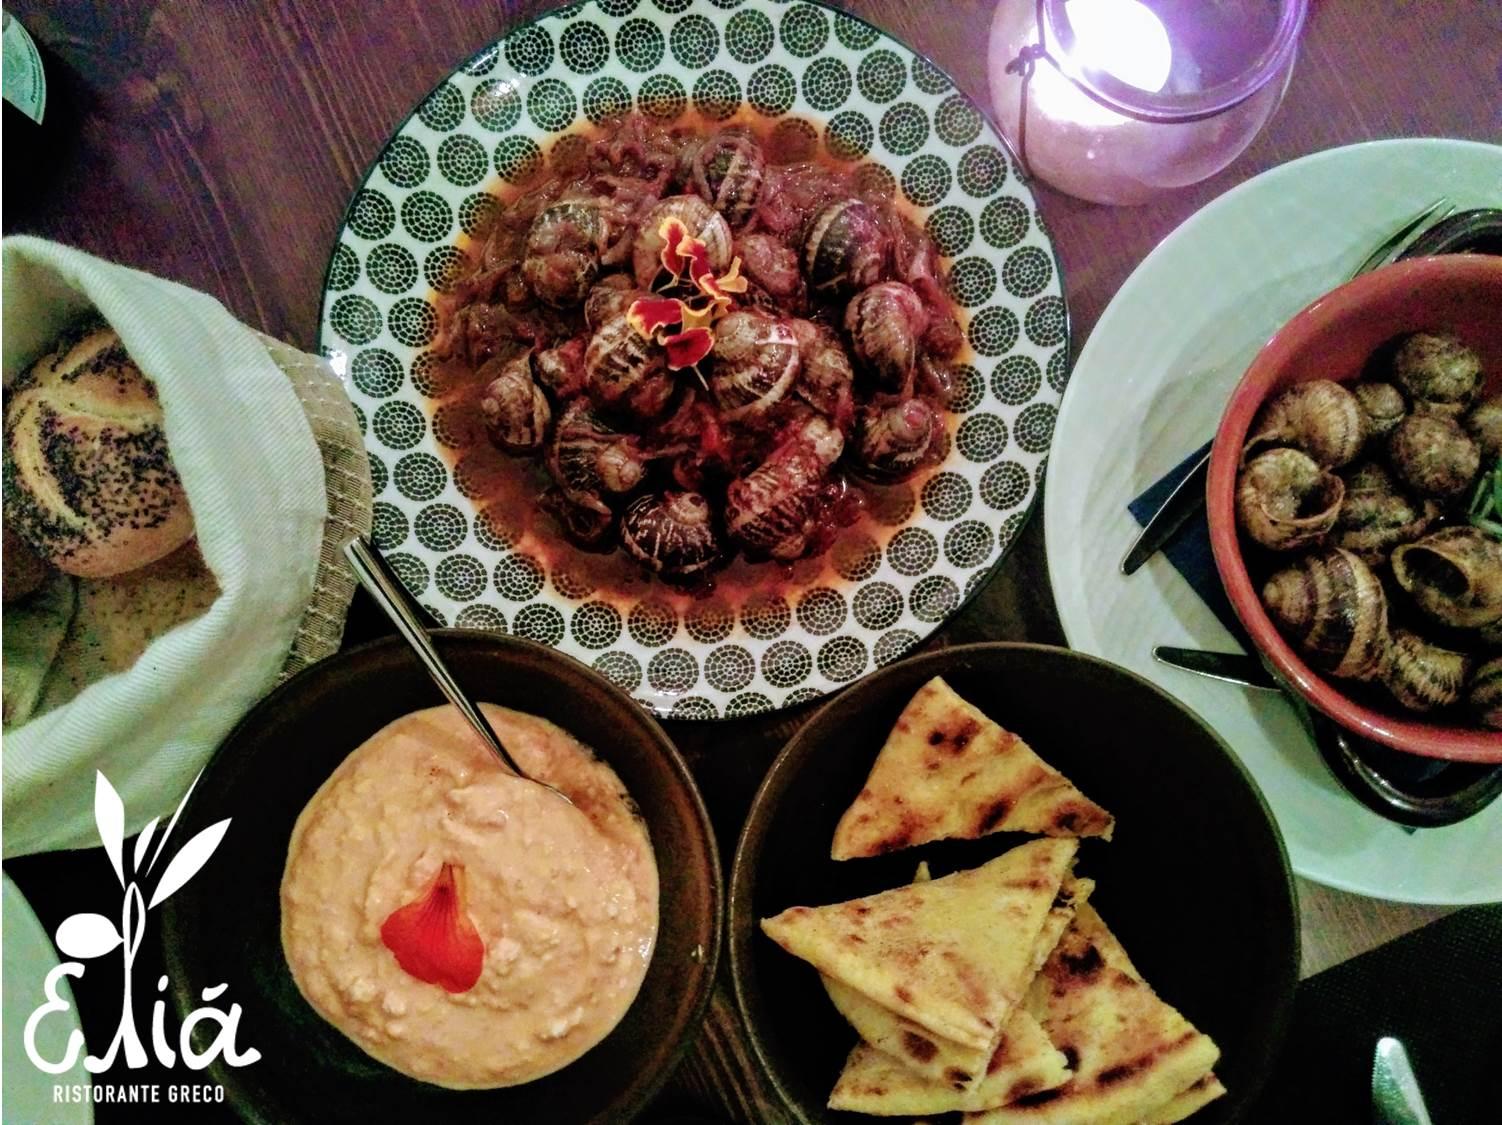 Elià ristorante greco a Trieste